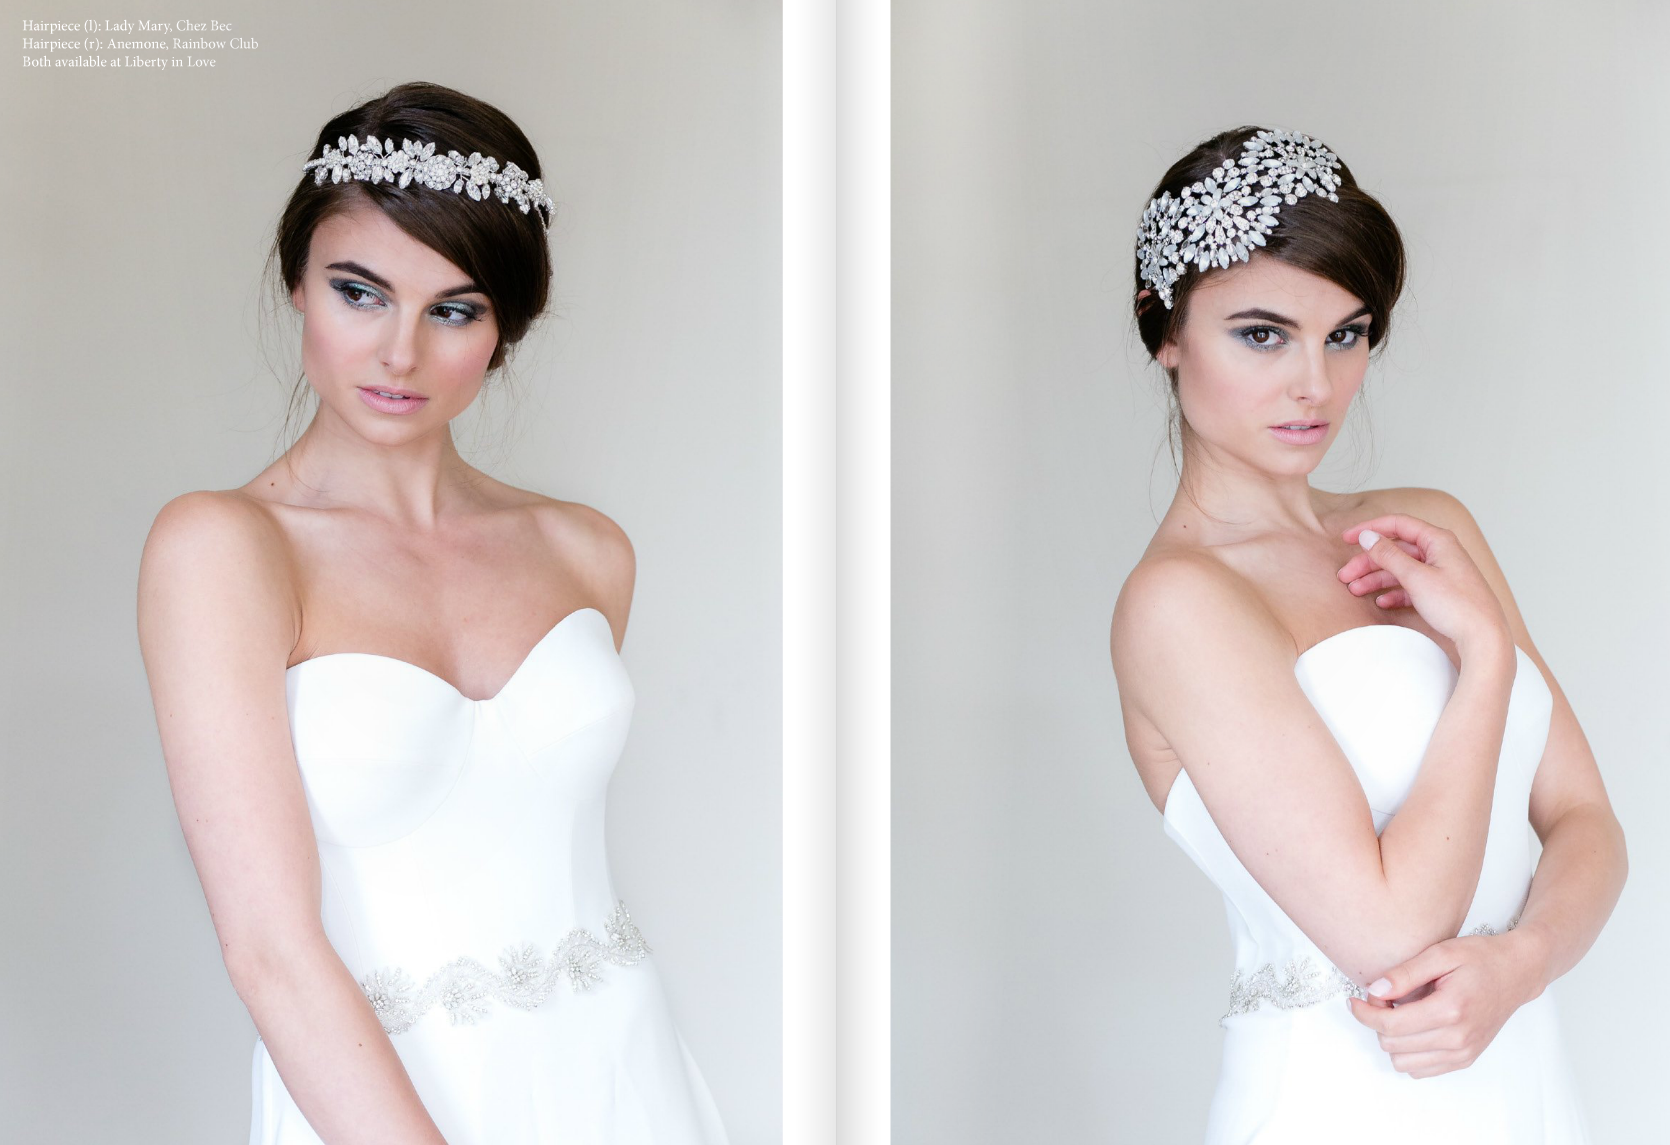 Rock my wedding bridal blog. Novello 2015 dominon by suzanne neville